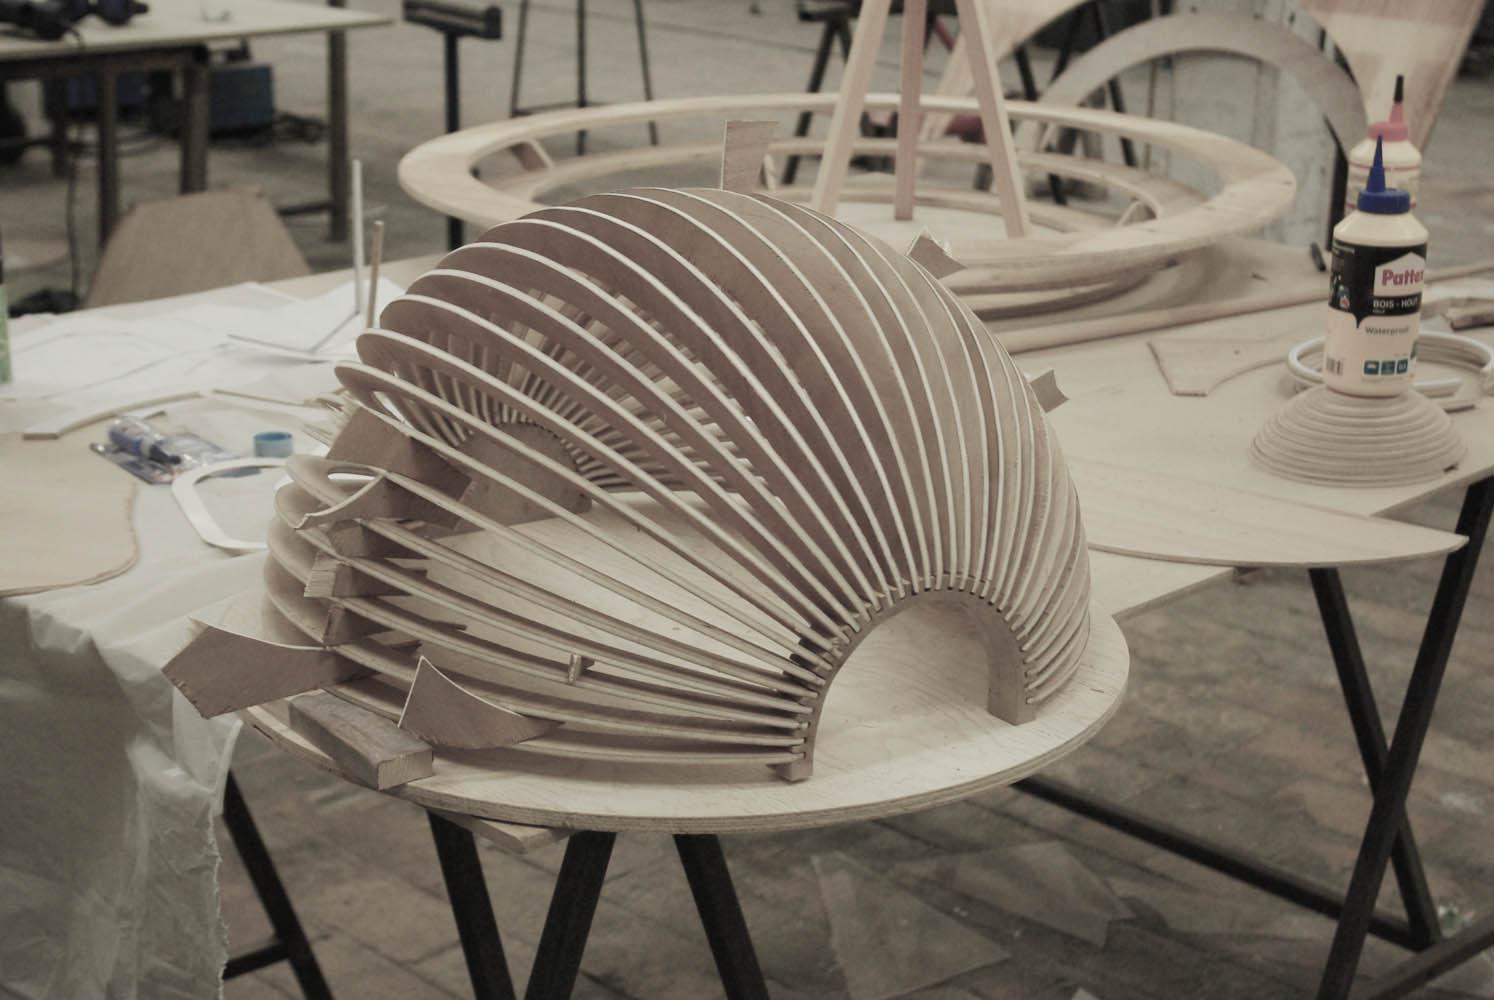 florent albinet-lille design4